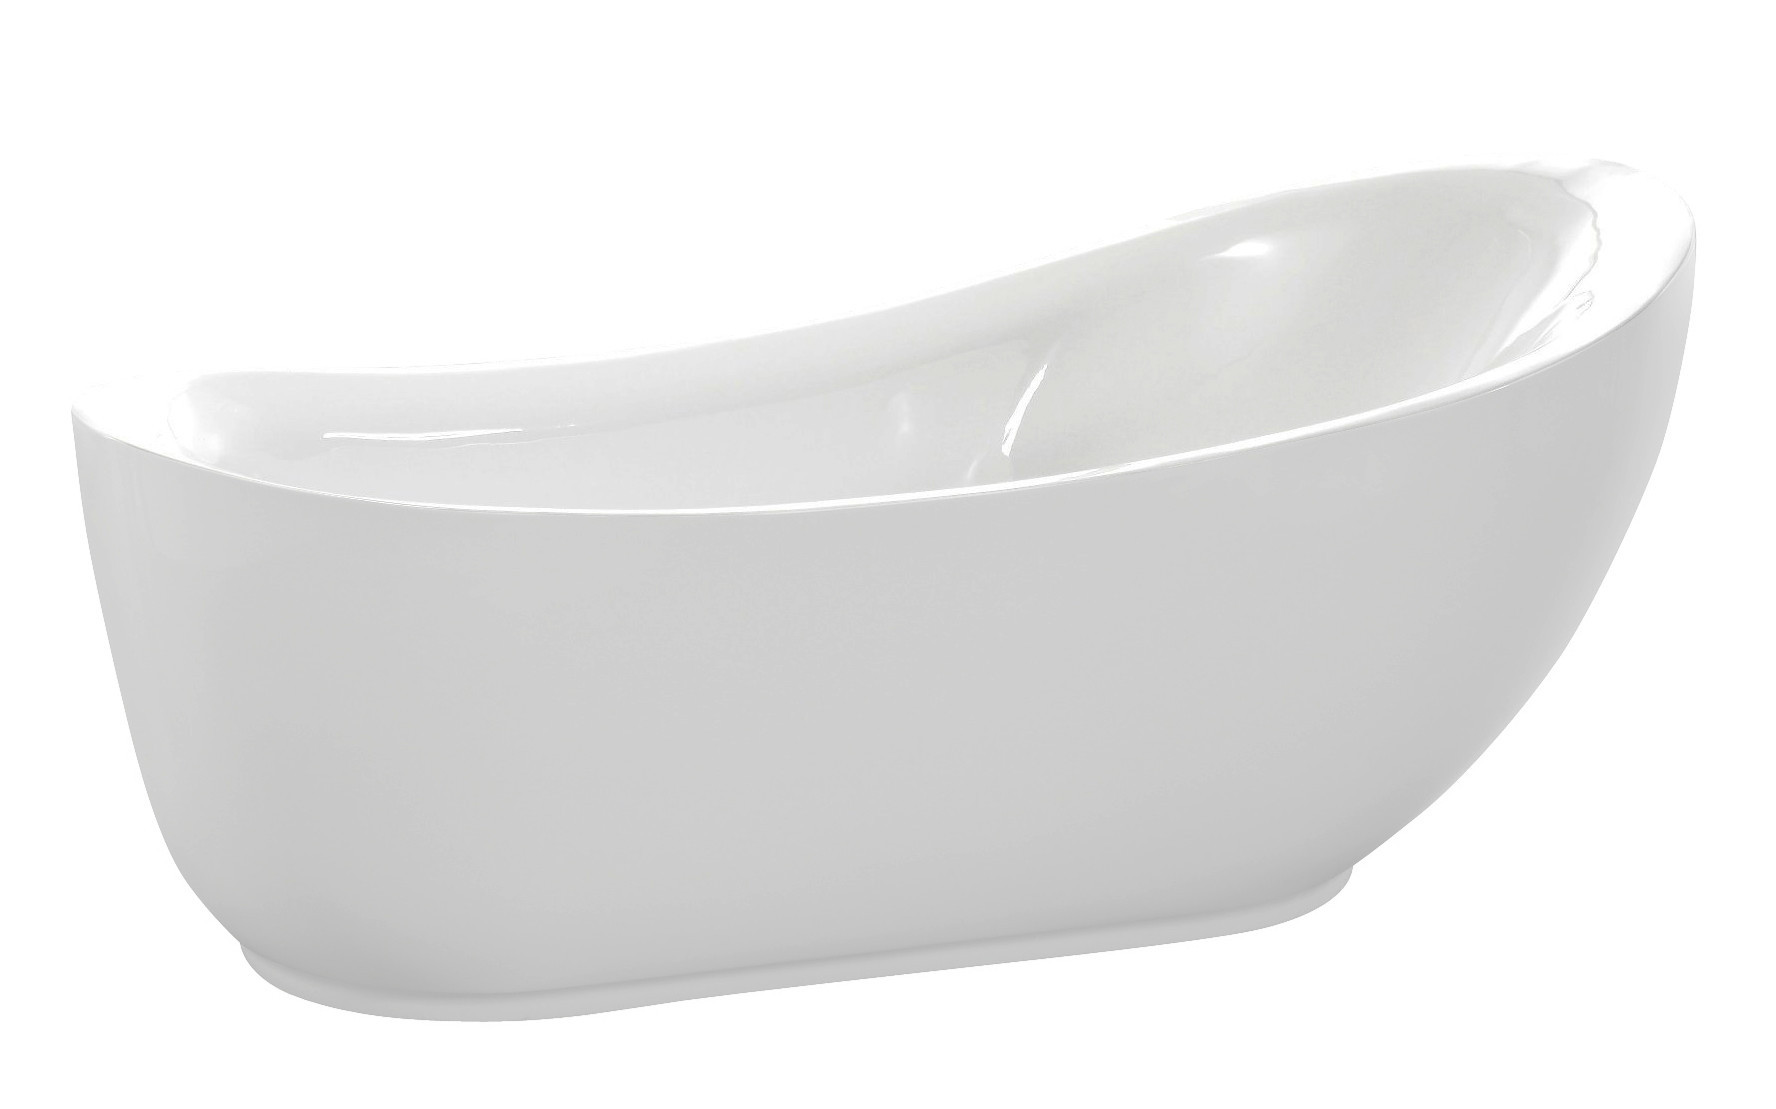 Anzzi FT-AZ090 Talyah Series 5.92 ft. Freestanding Bathtub in White